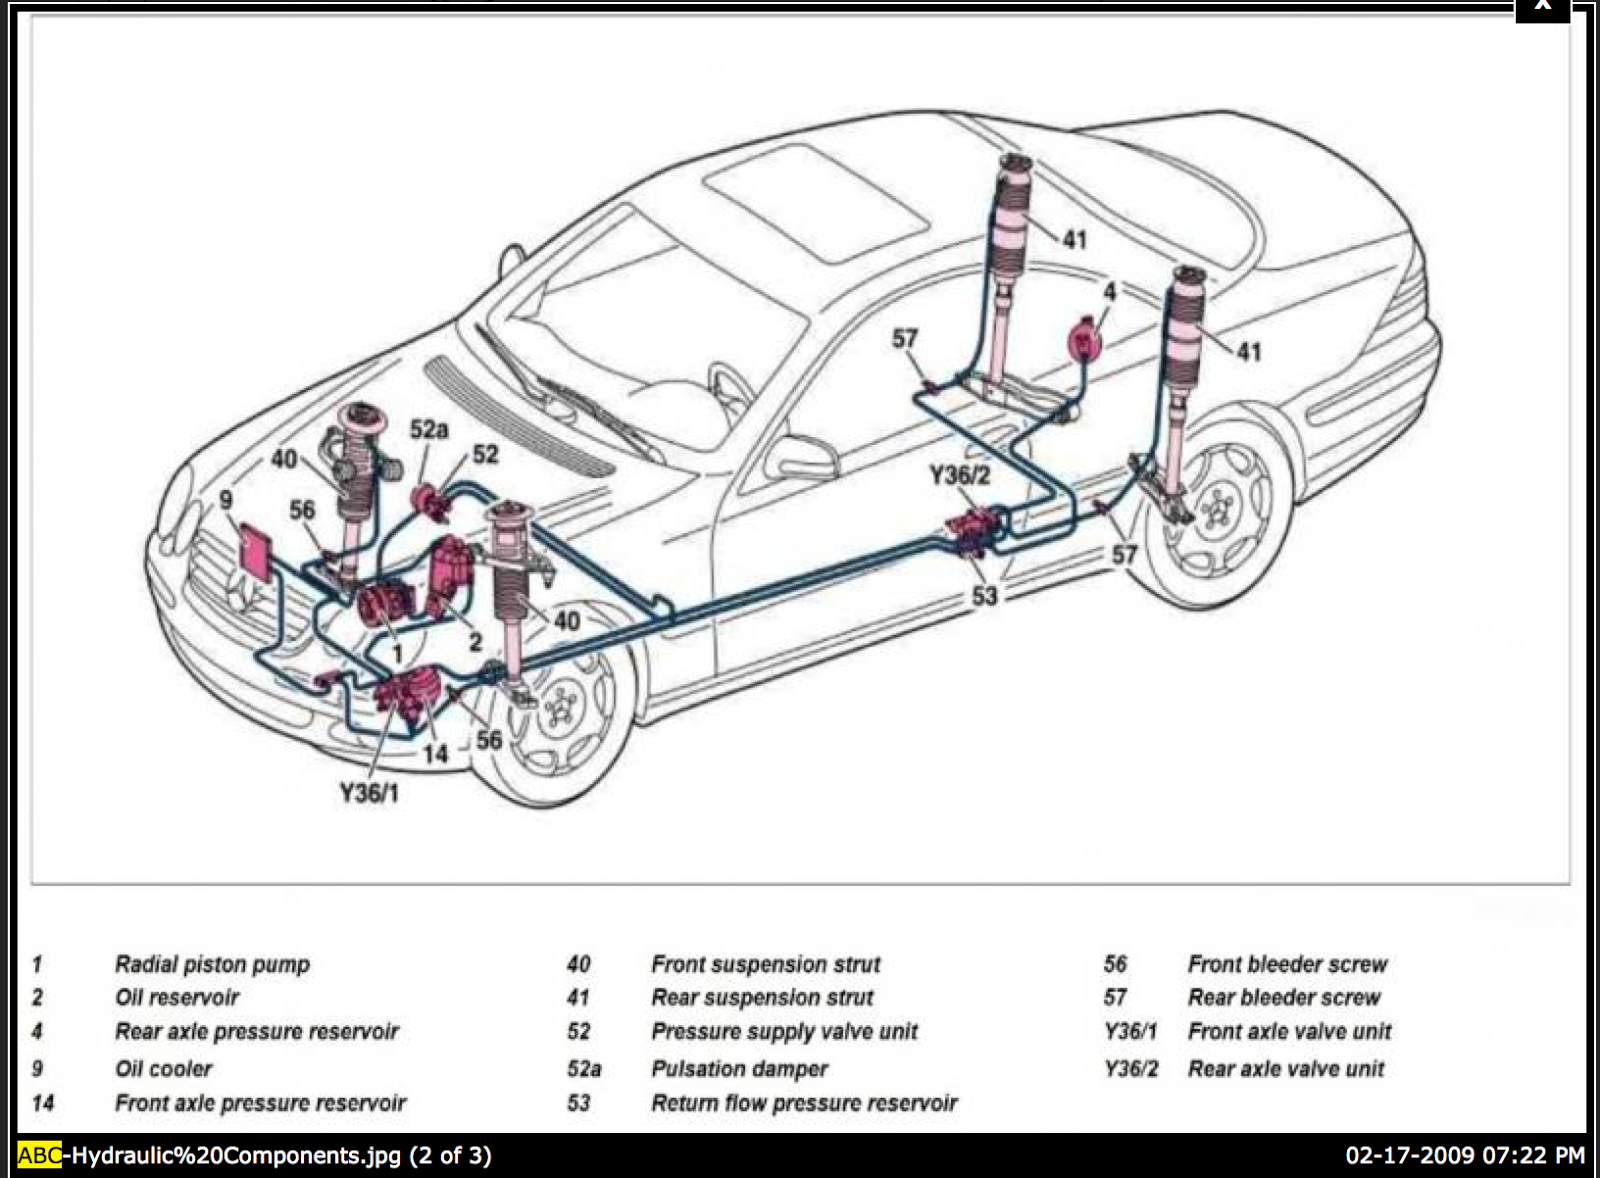 ml350 rear fuse diagram